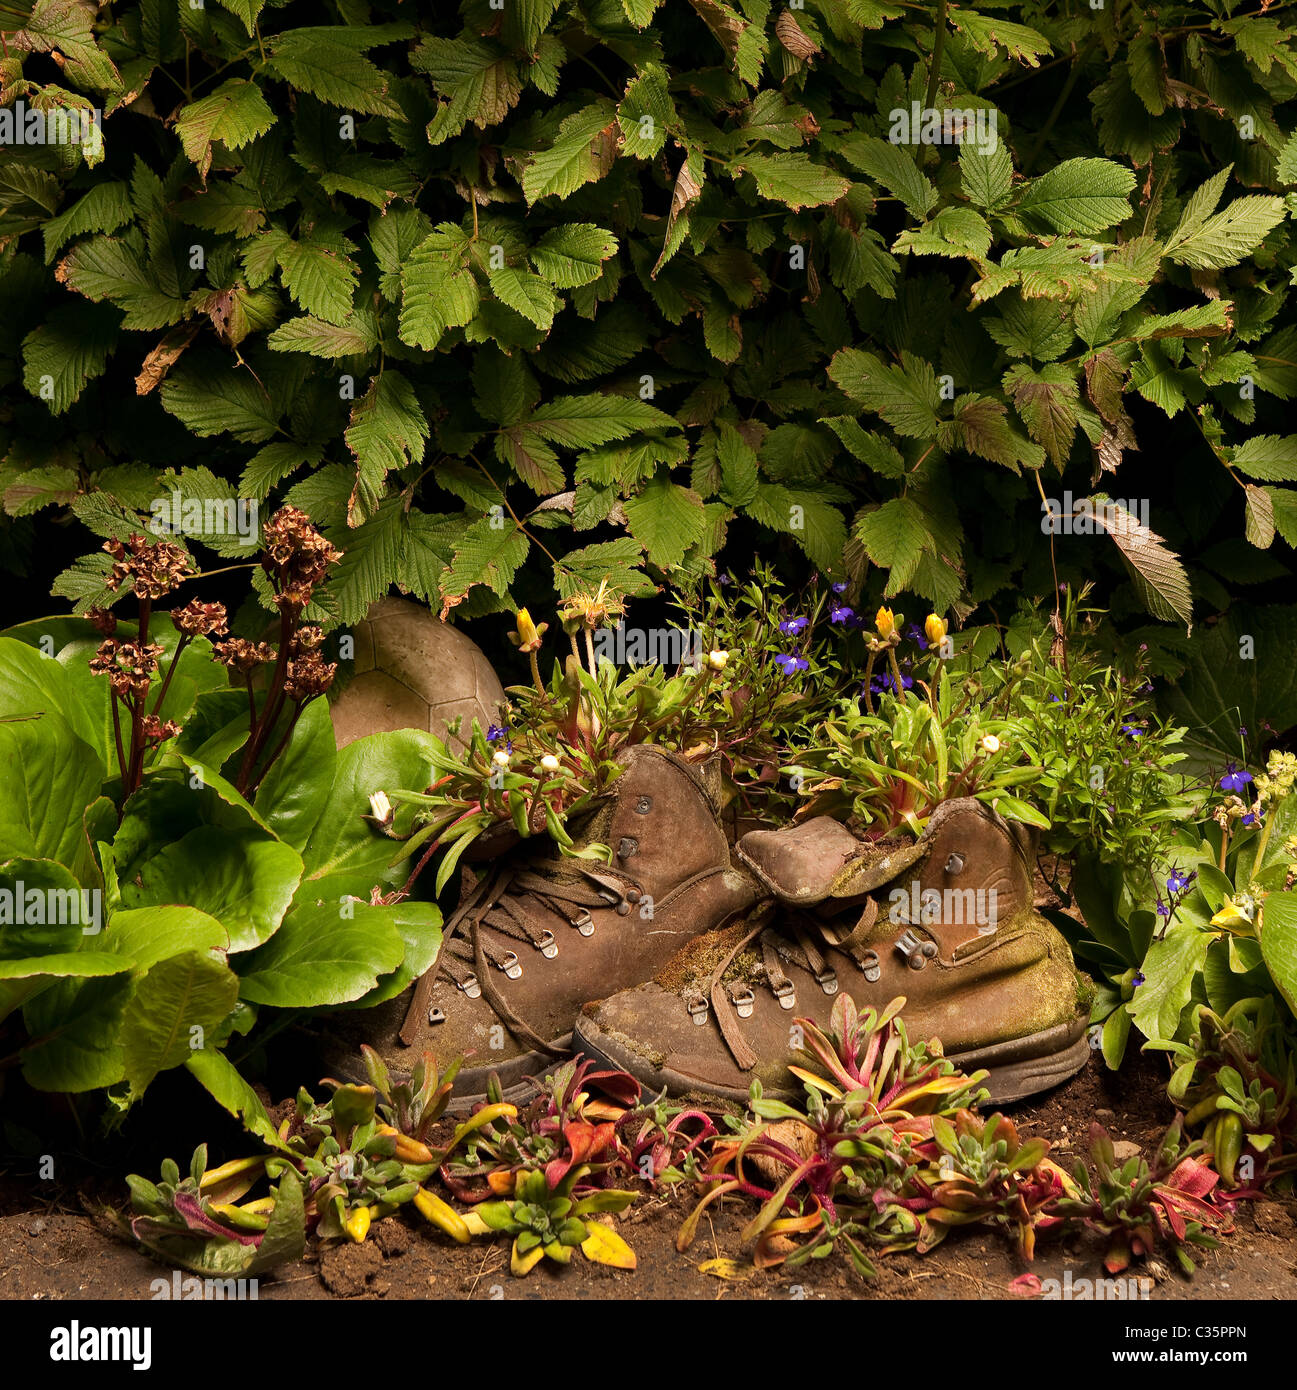 Atlantic Garden Stock Photos & Atlantic Garden Stock Images - Alamy